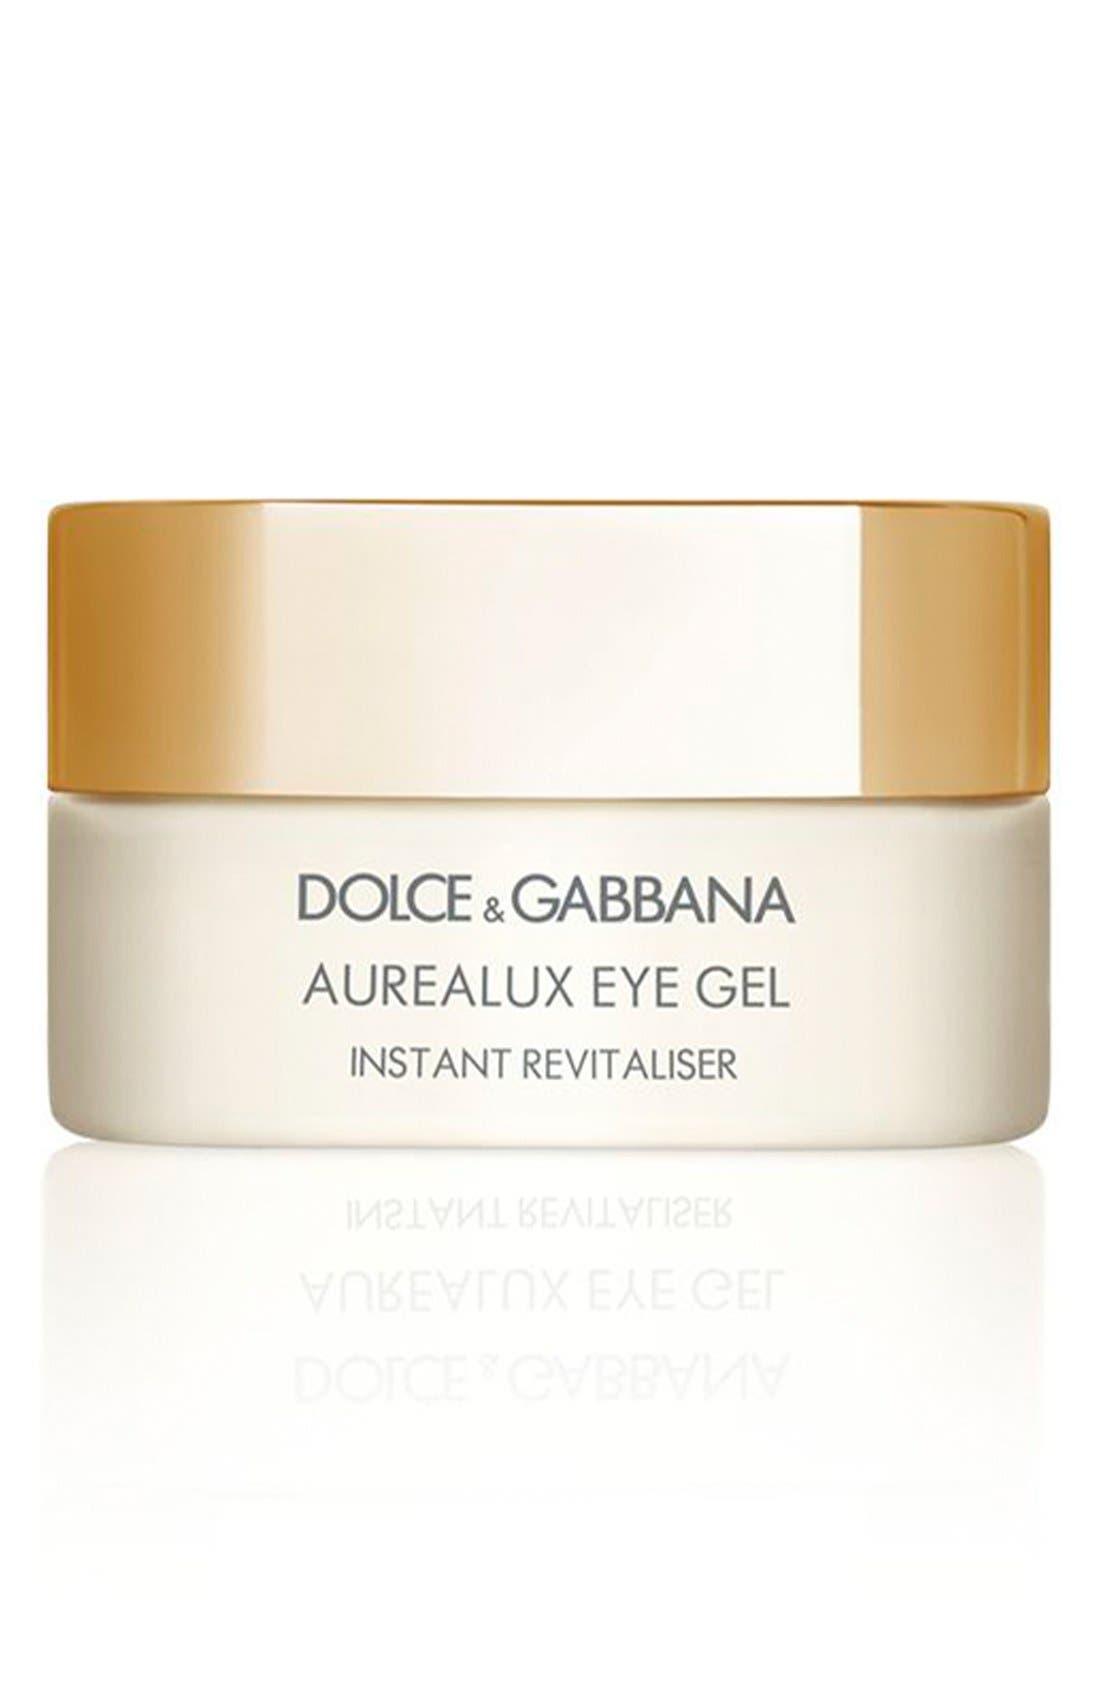 'Aurealux' Eye Gel Instant Revitaliser,                         Main,                         color, 000